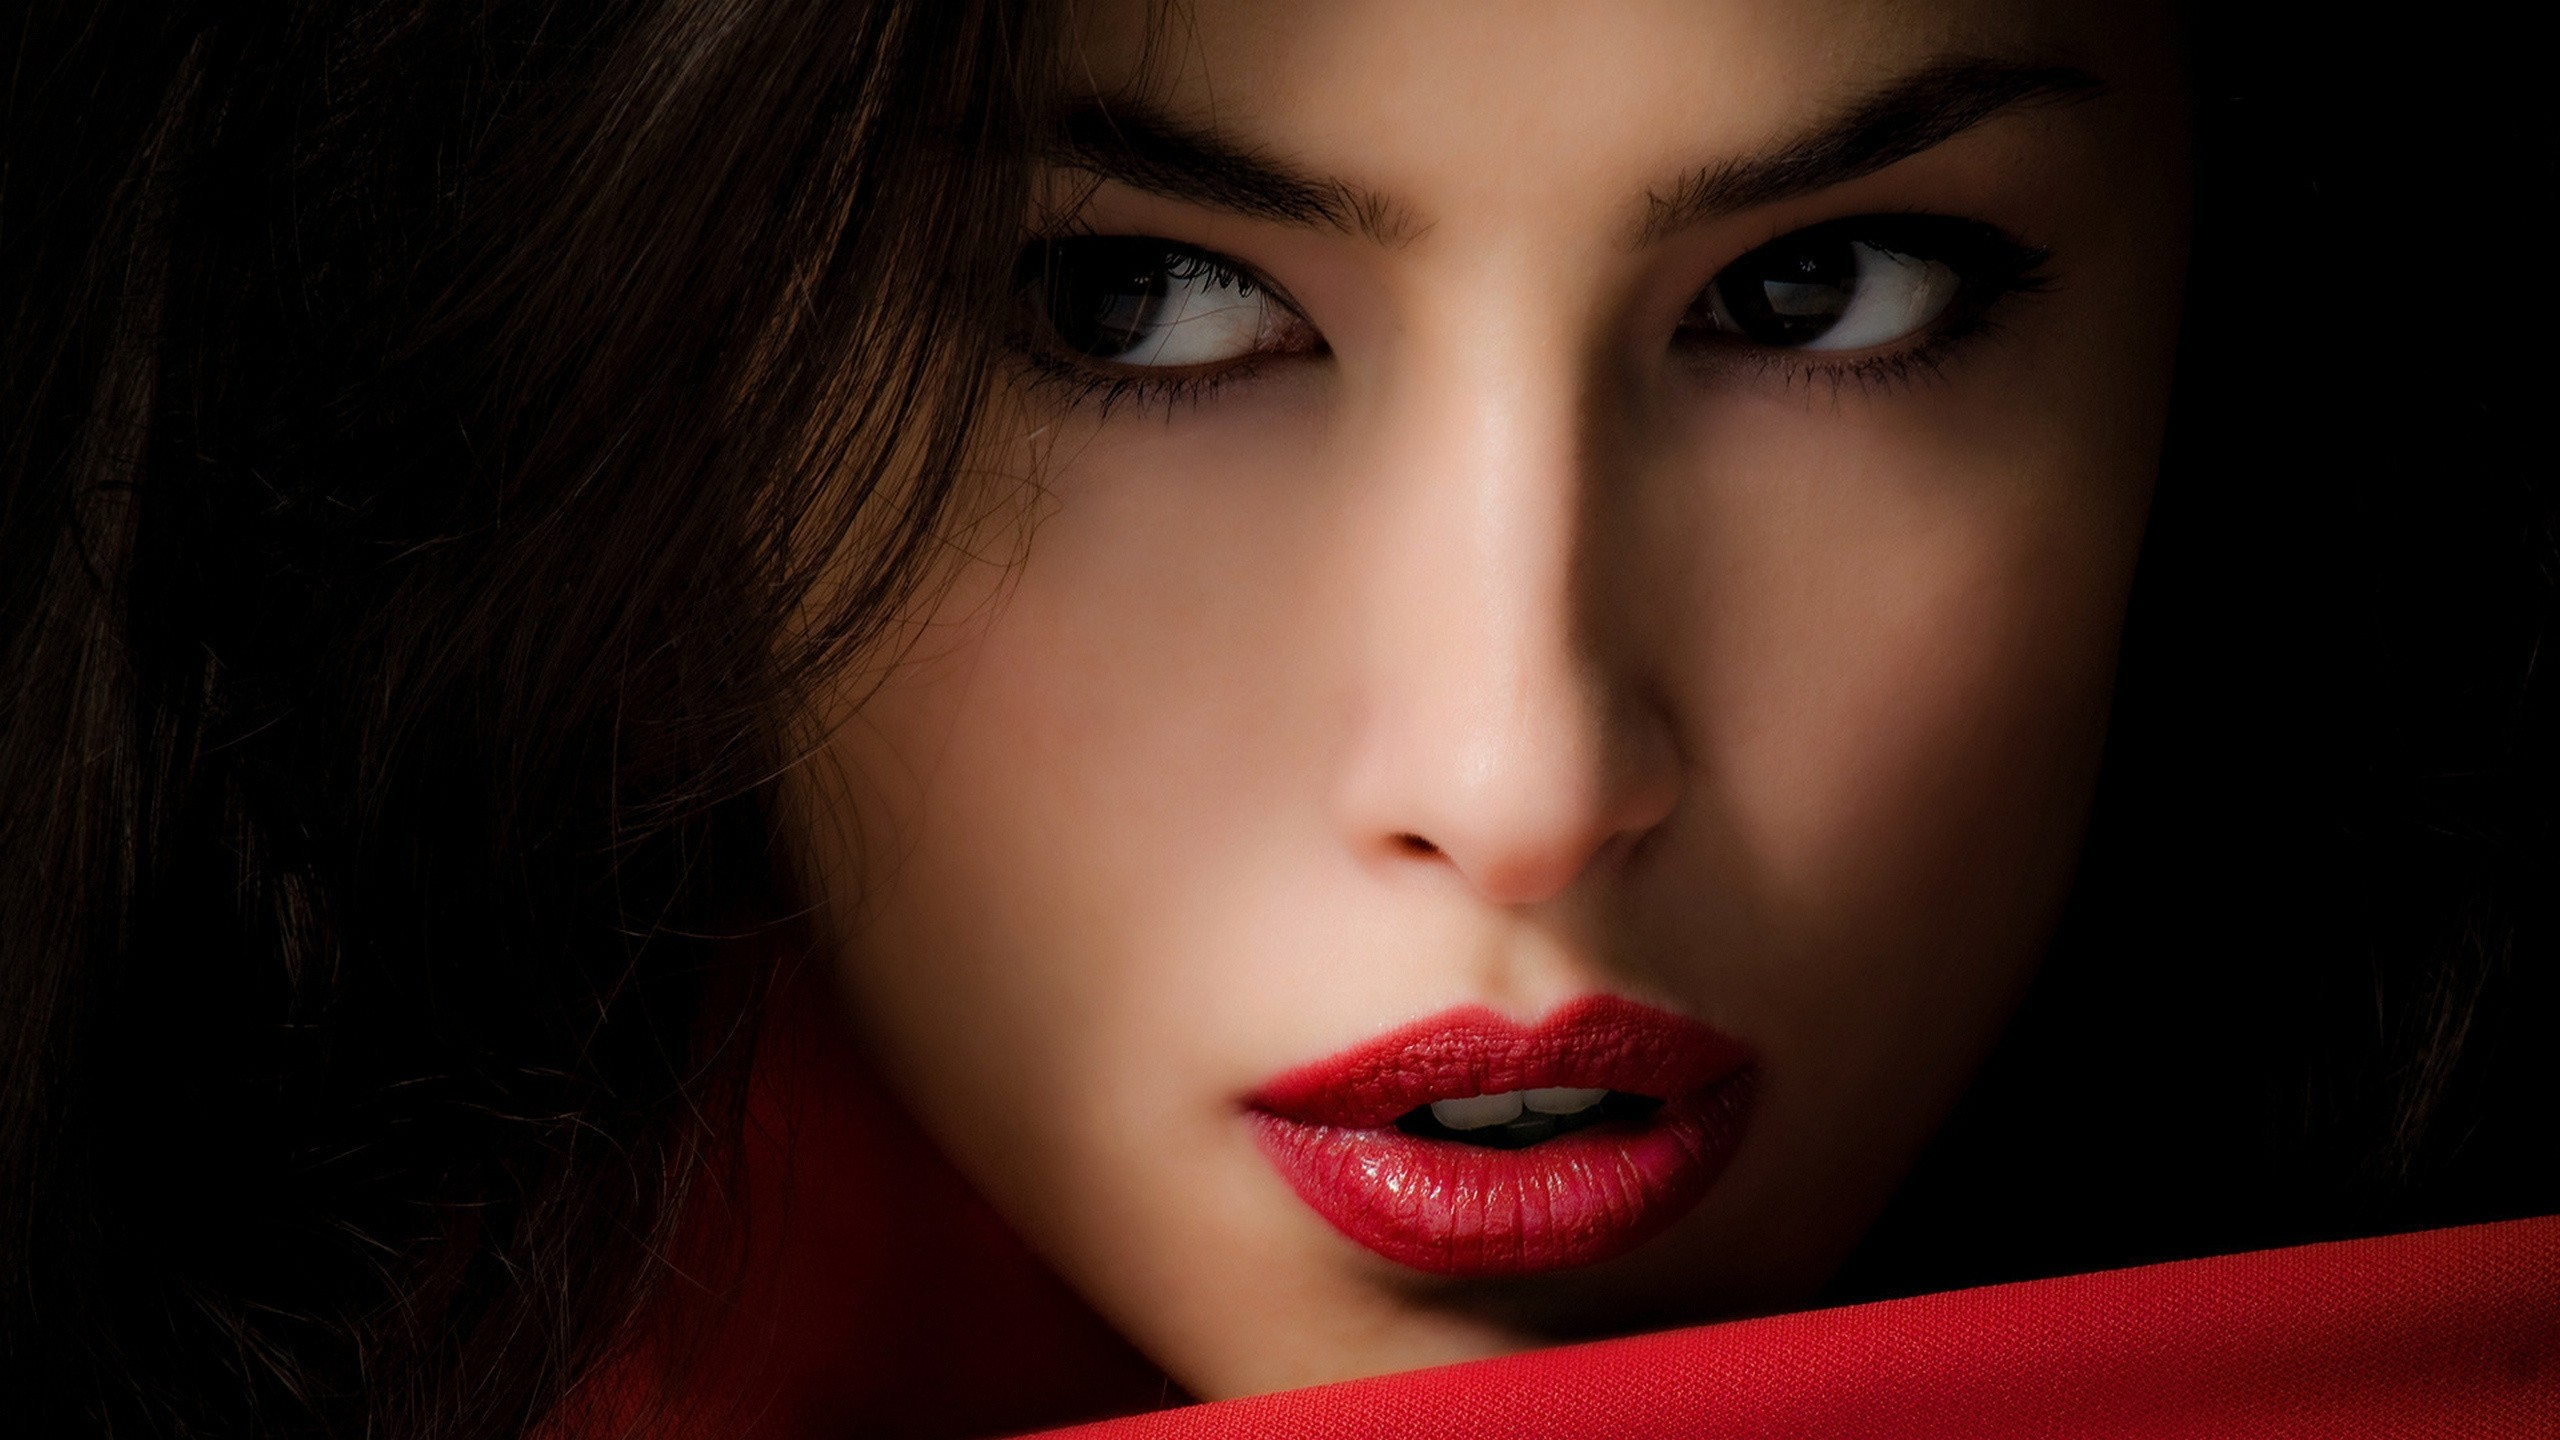 Wallpaper girl, brunette, model, person, lipstick, bright, makeup